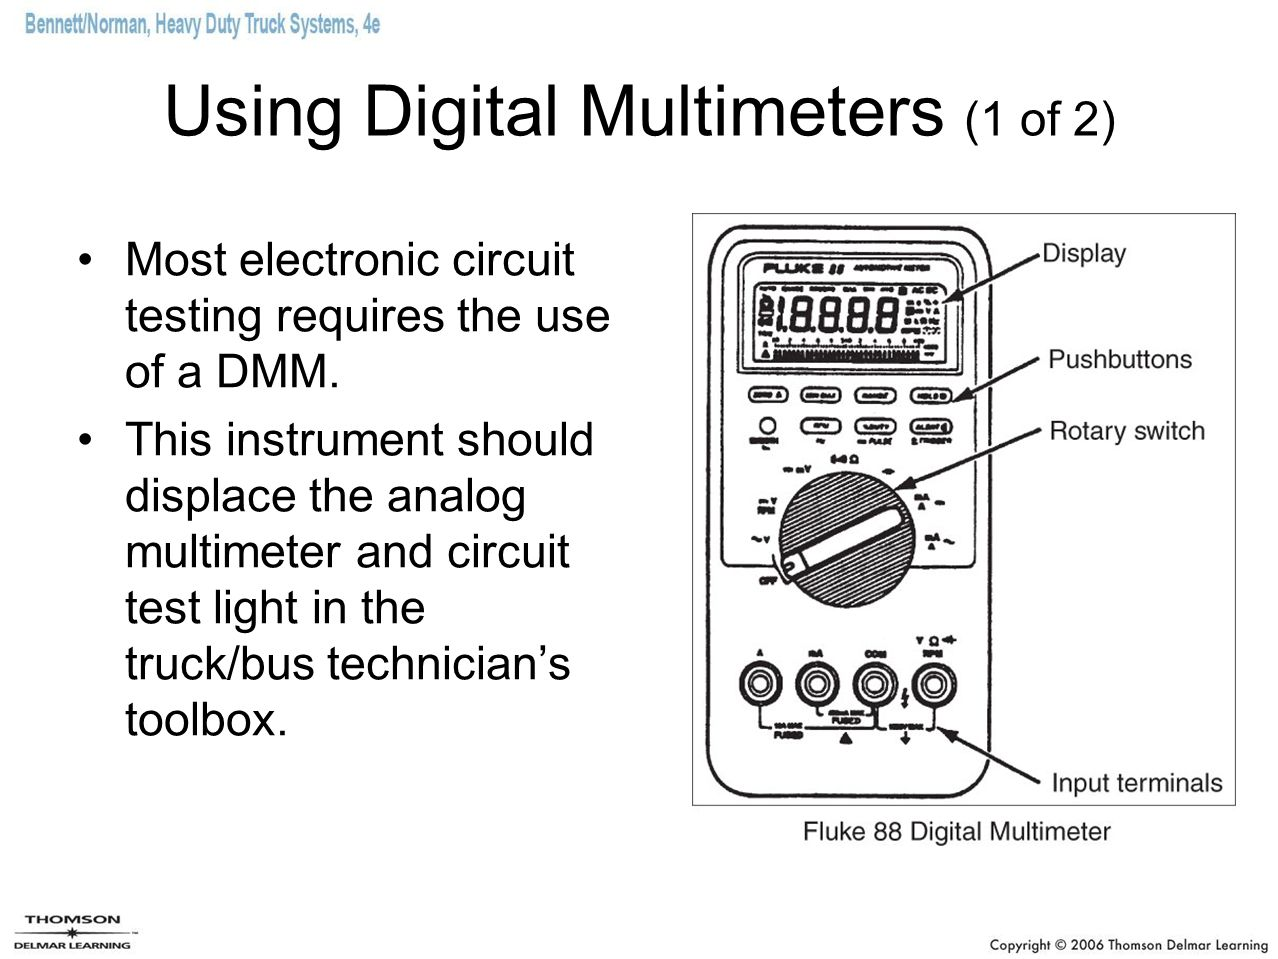 Using Digital Multimeters (1 of 2)